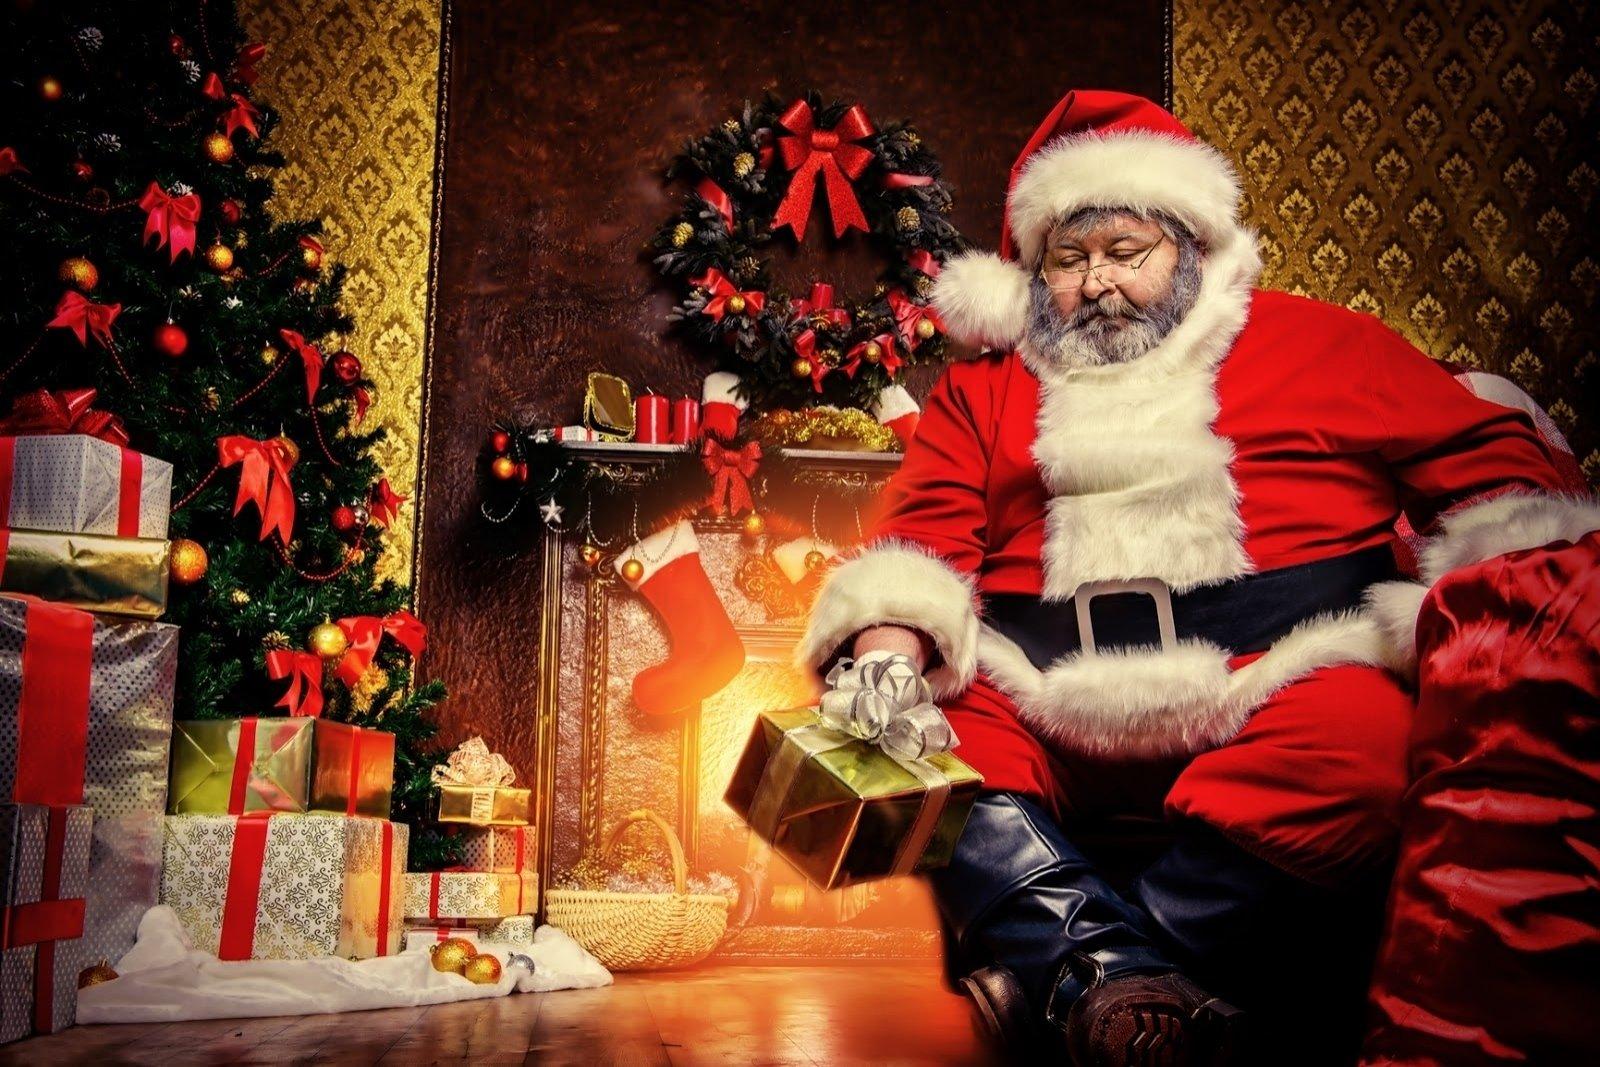 节日 - 圣诞节  Santa Claus 礼物 Christmas Tree 壁纸